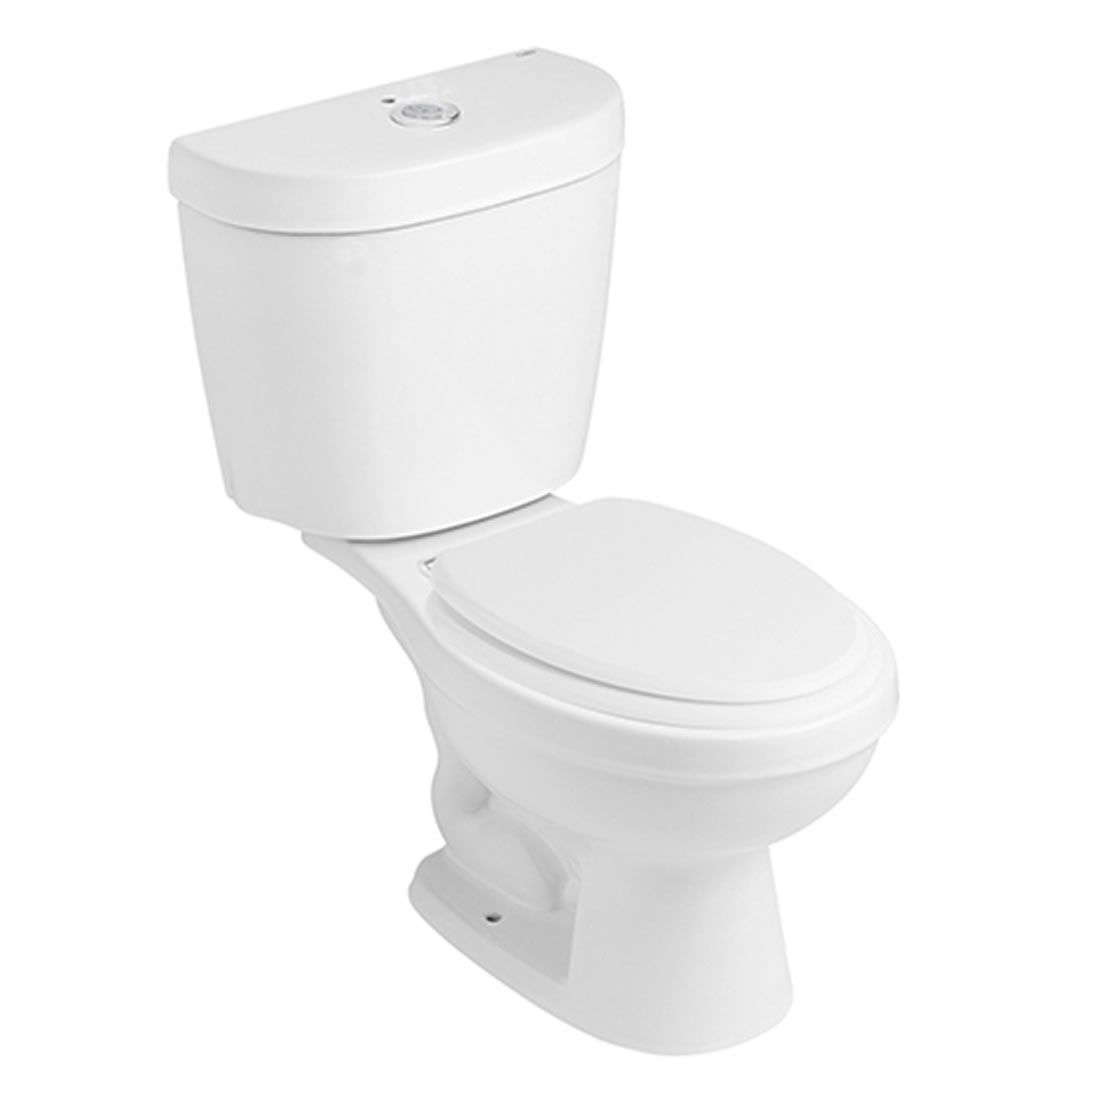 Conjunto Vaso Sanitário com Caixa Acoplada 3/6L Ecoflush Infantil Branco Celite